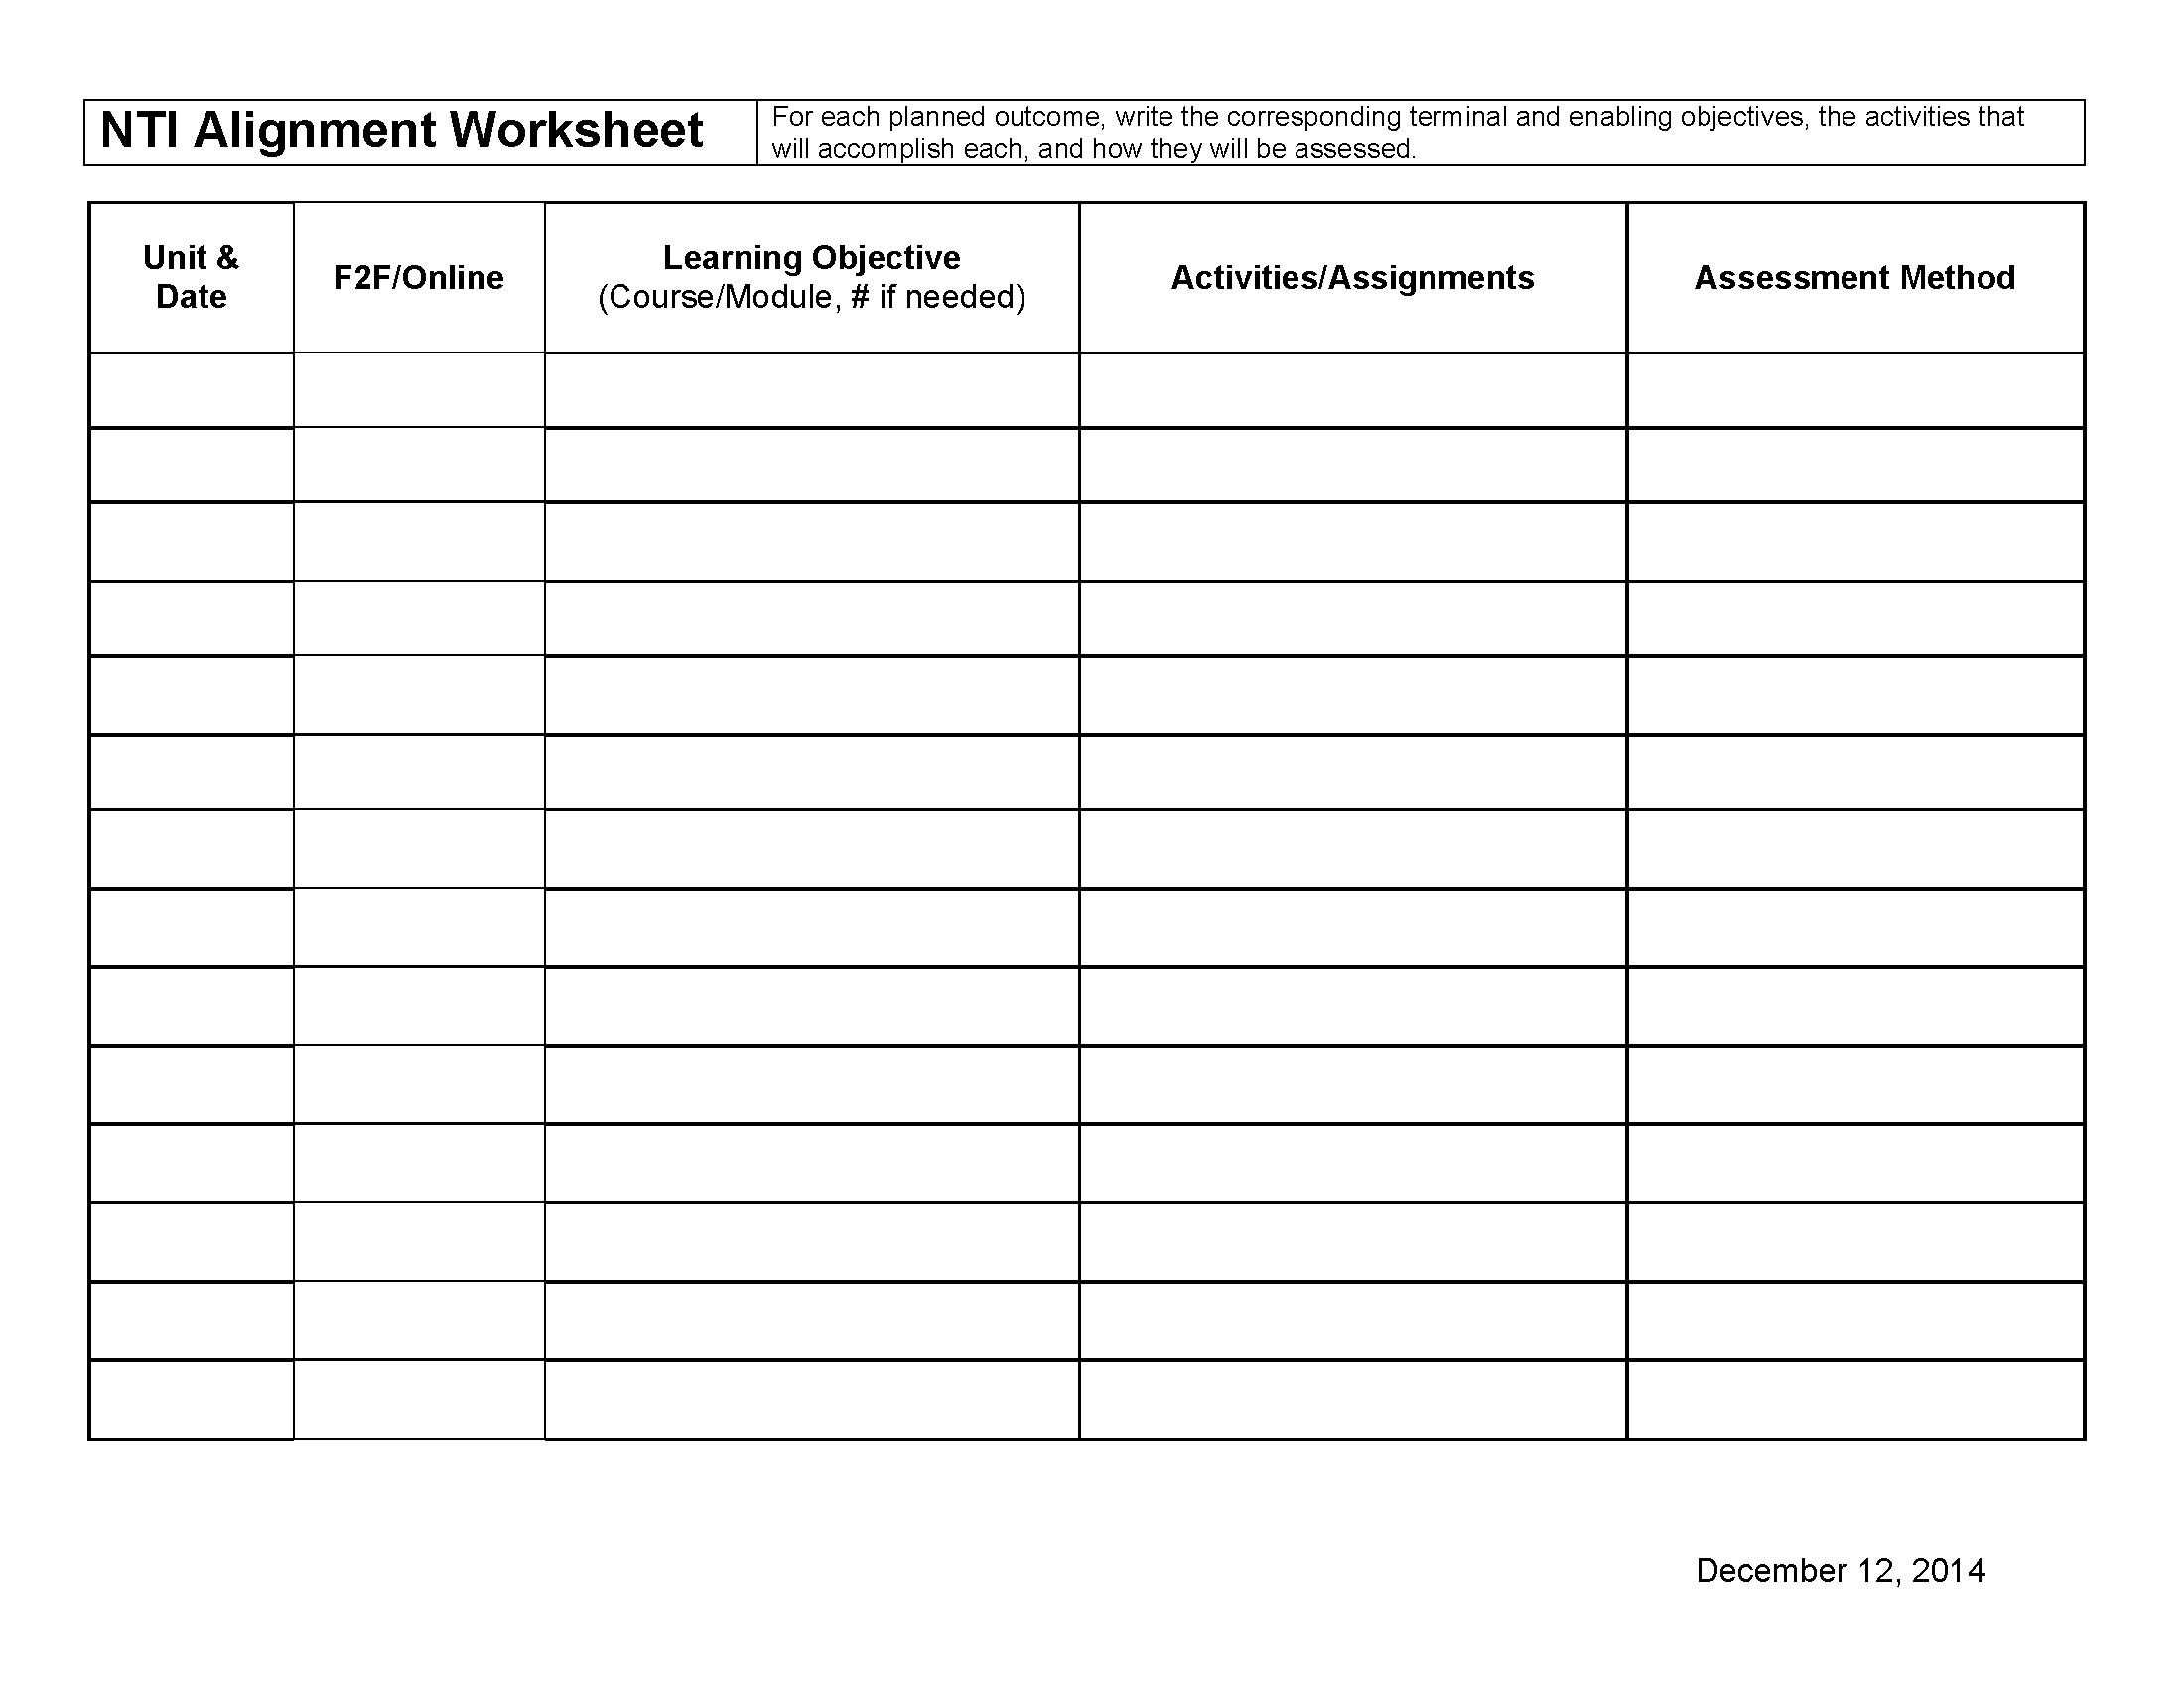 Hybrid Course Alignment Worksheet